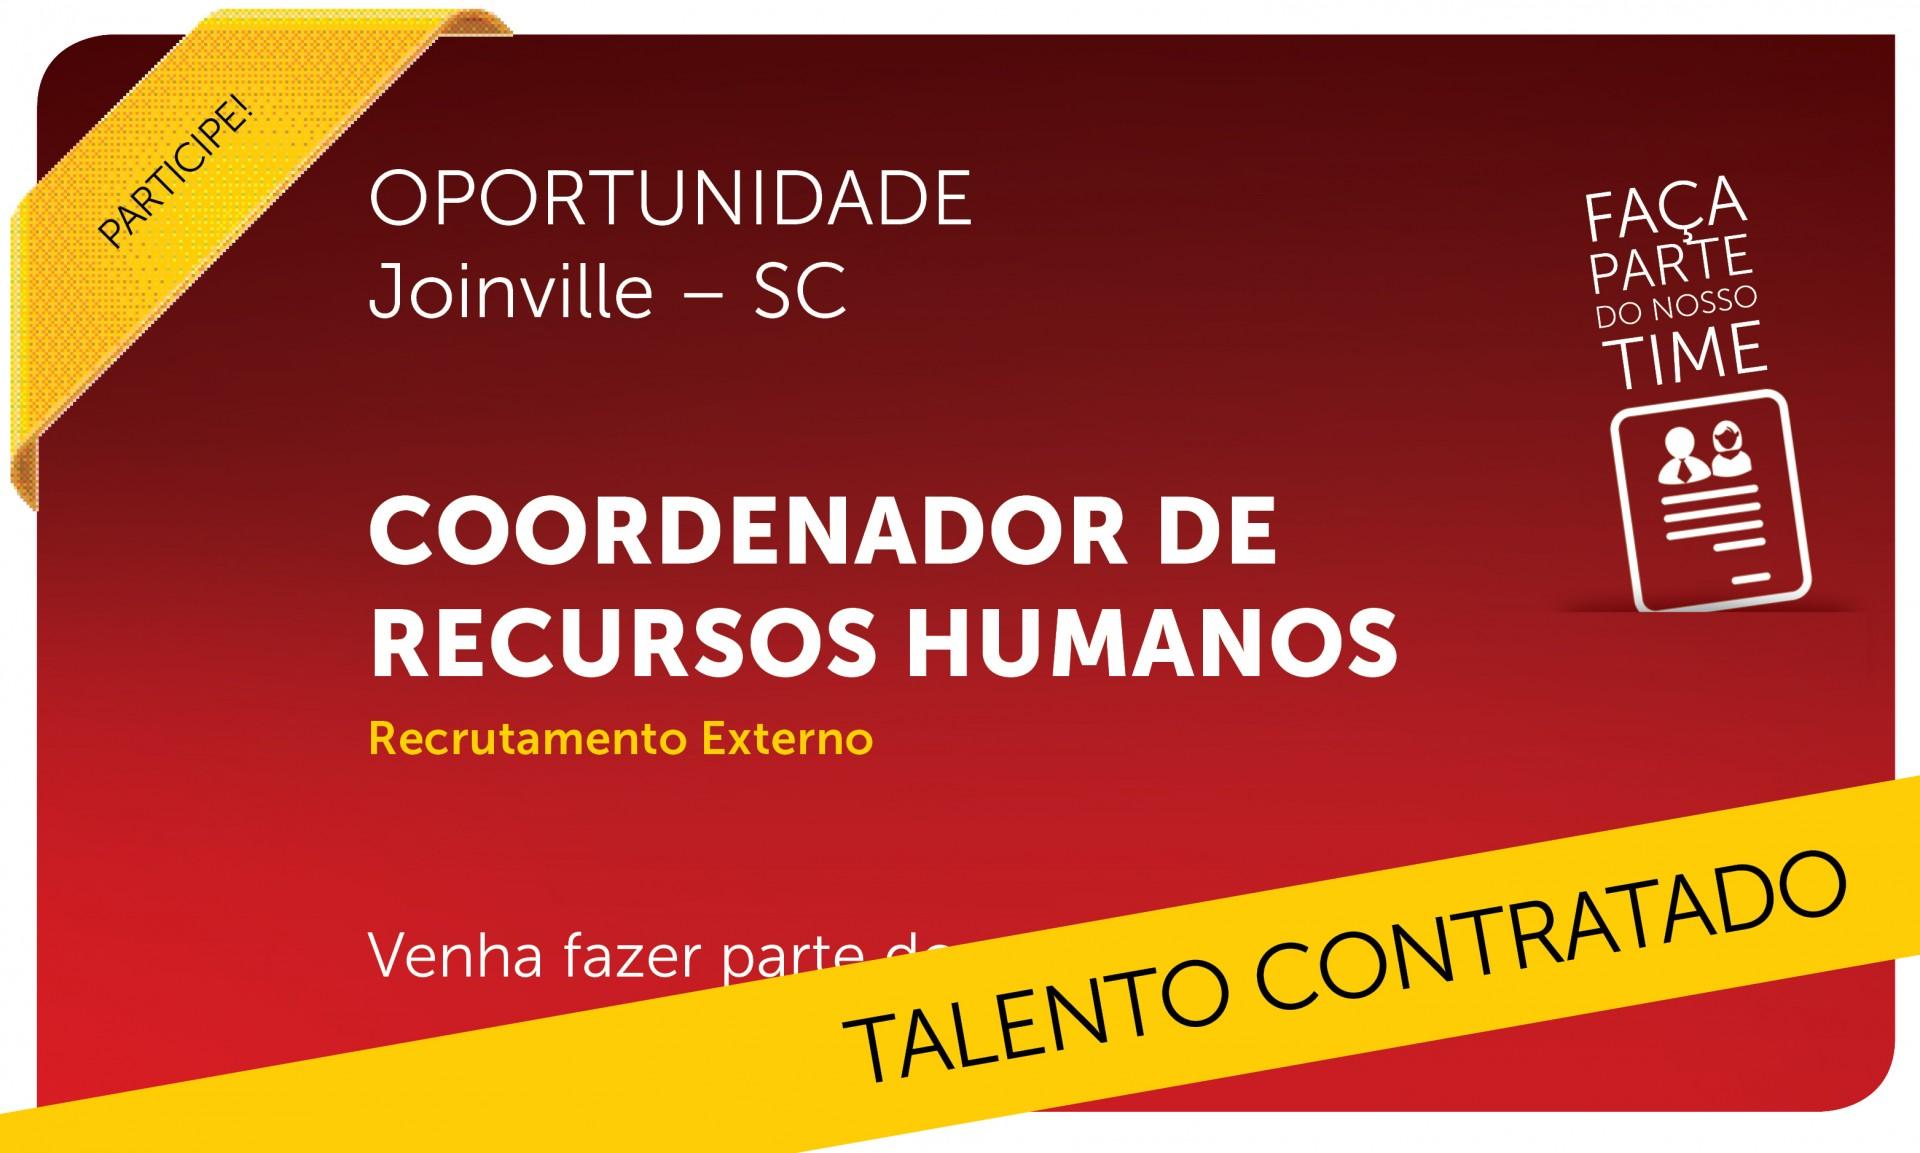 Coordenador de Recursos Humanos   Joinville - SC